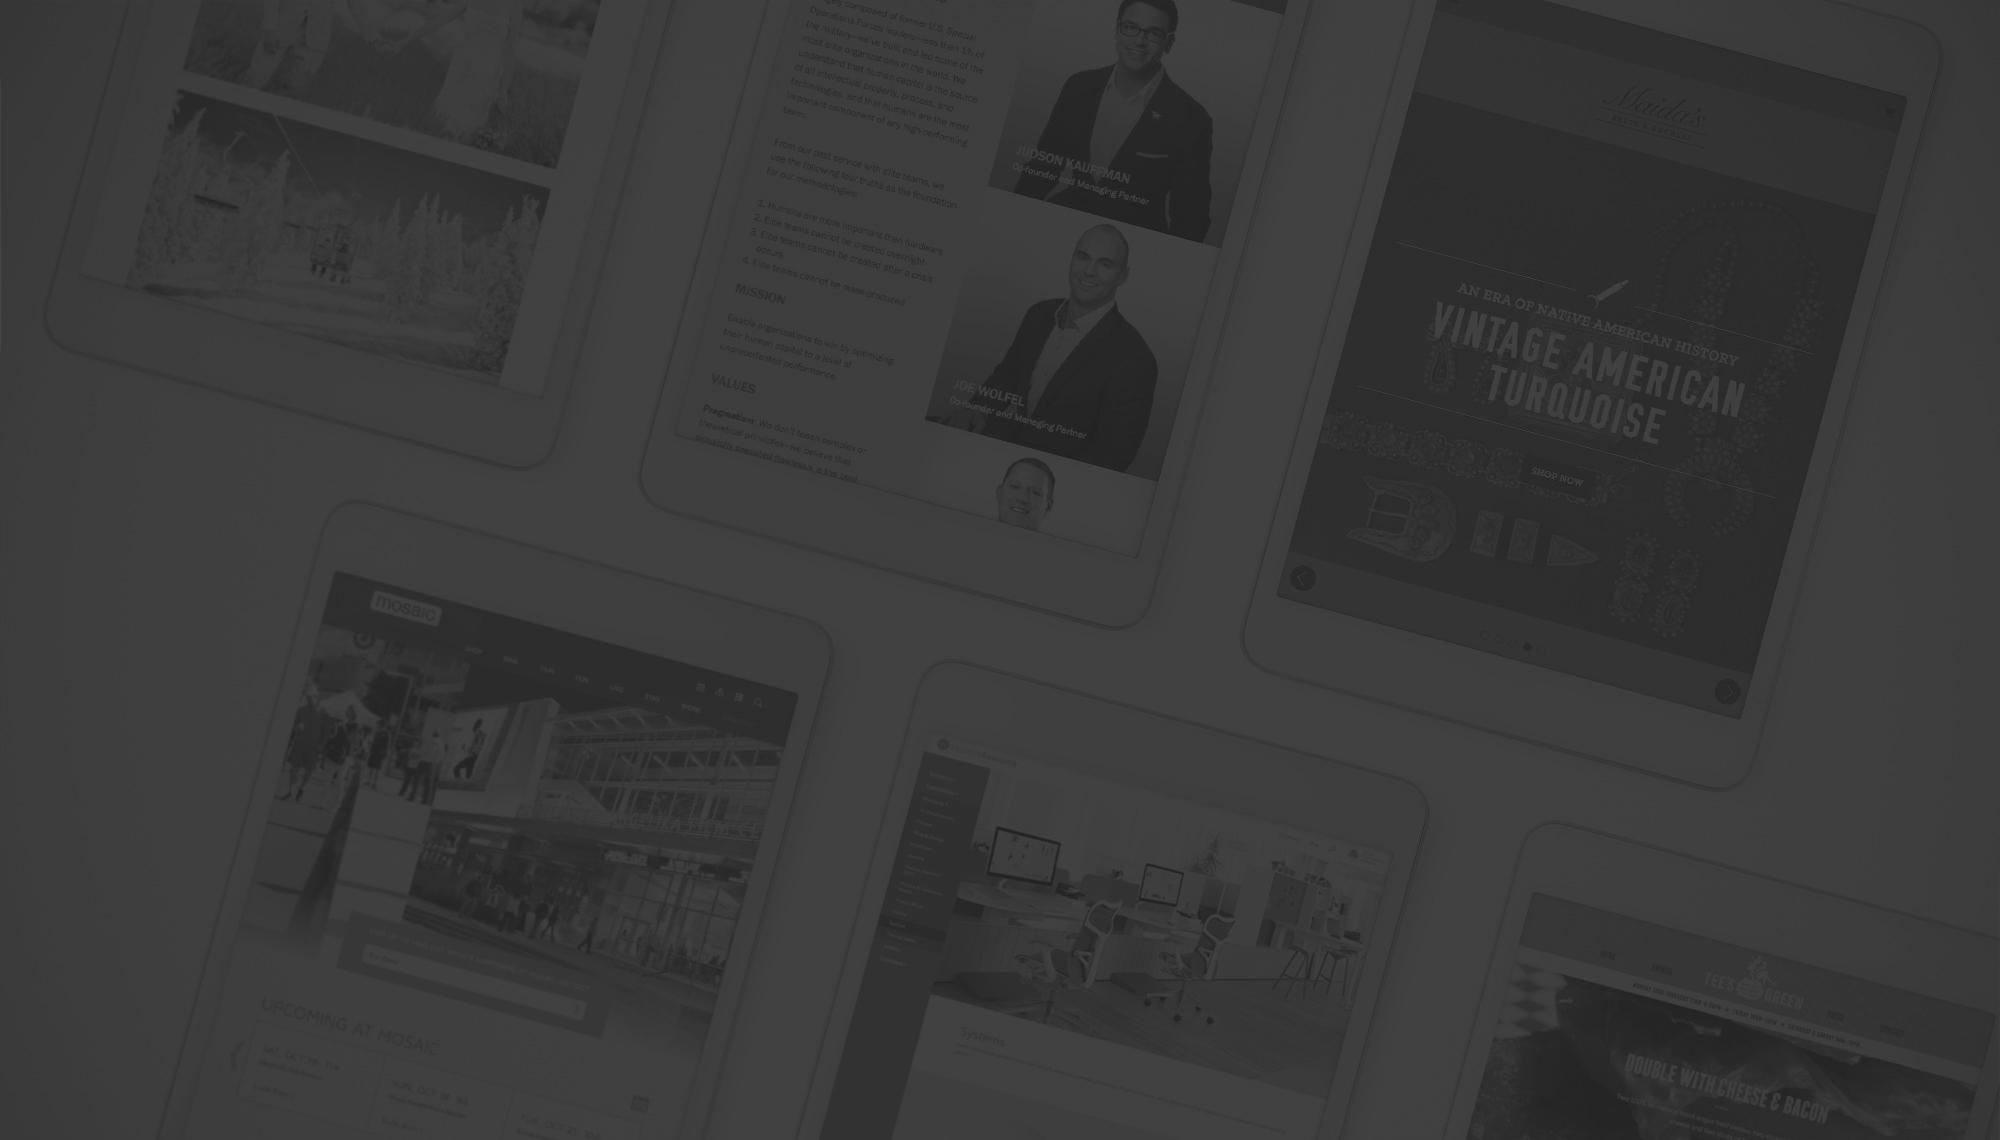 Website Design Company in Austin